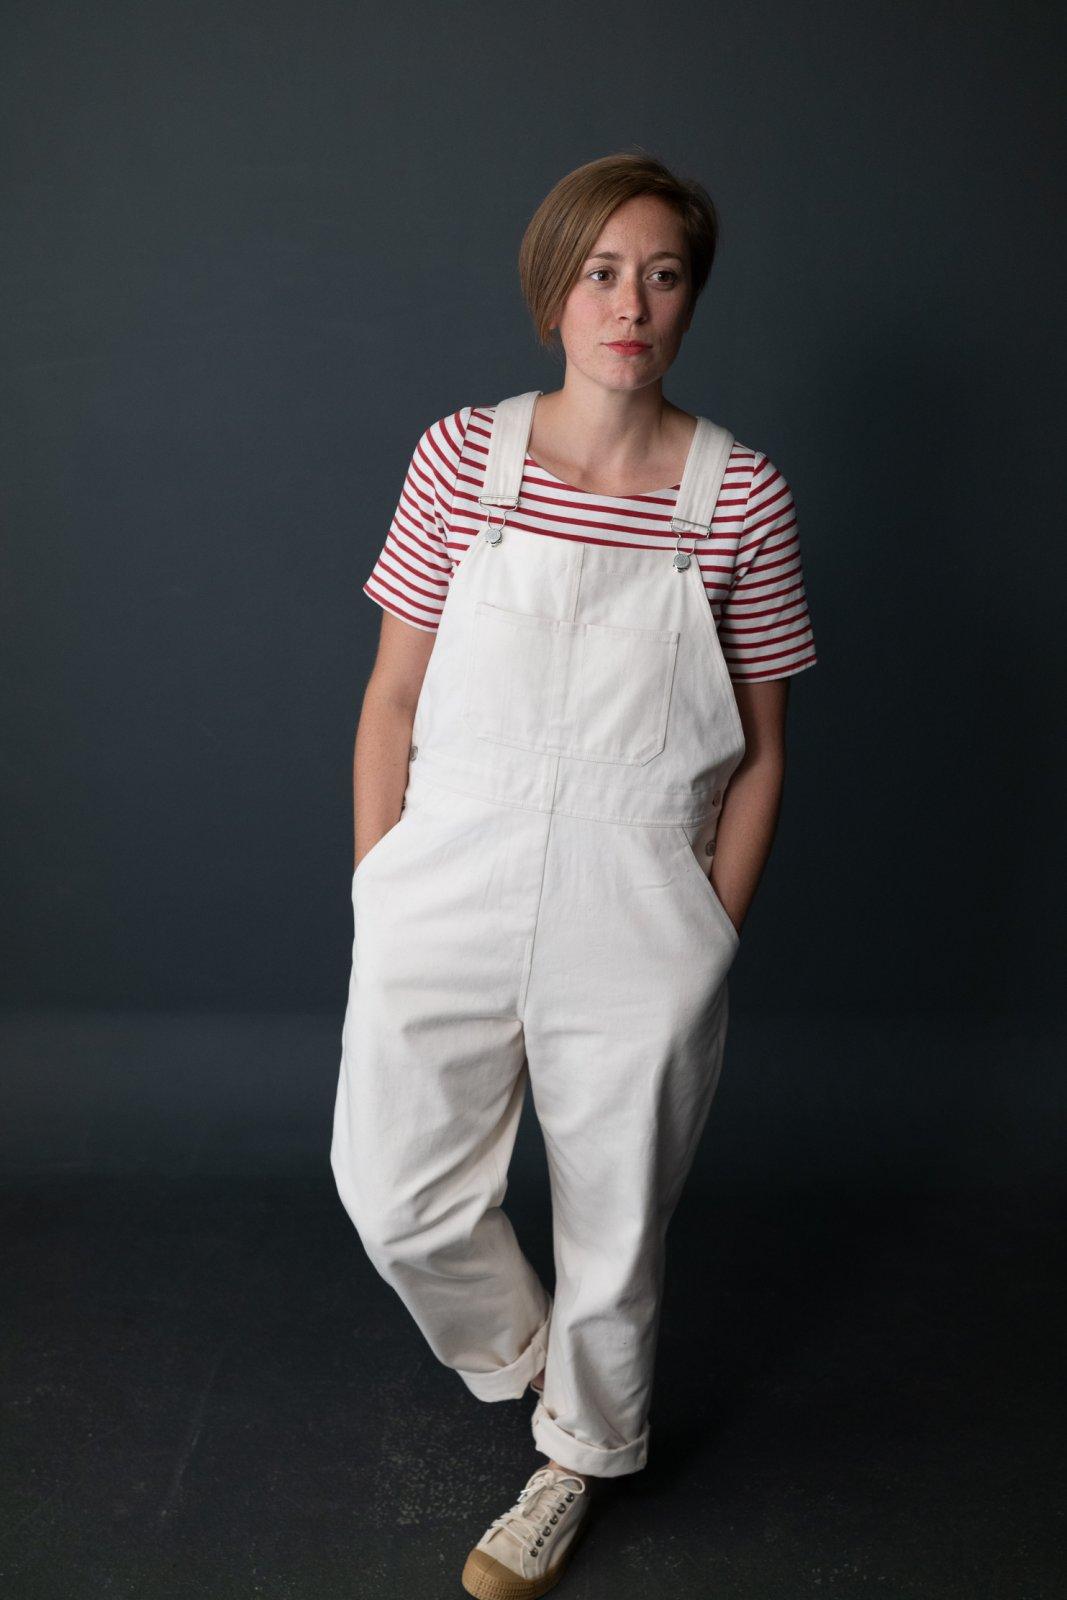 Harlene Dungarees (Sizes UK 6 - 18) - Merchant & Mills Patterns